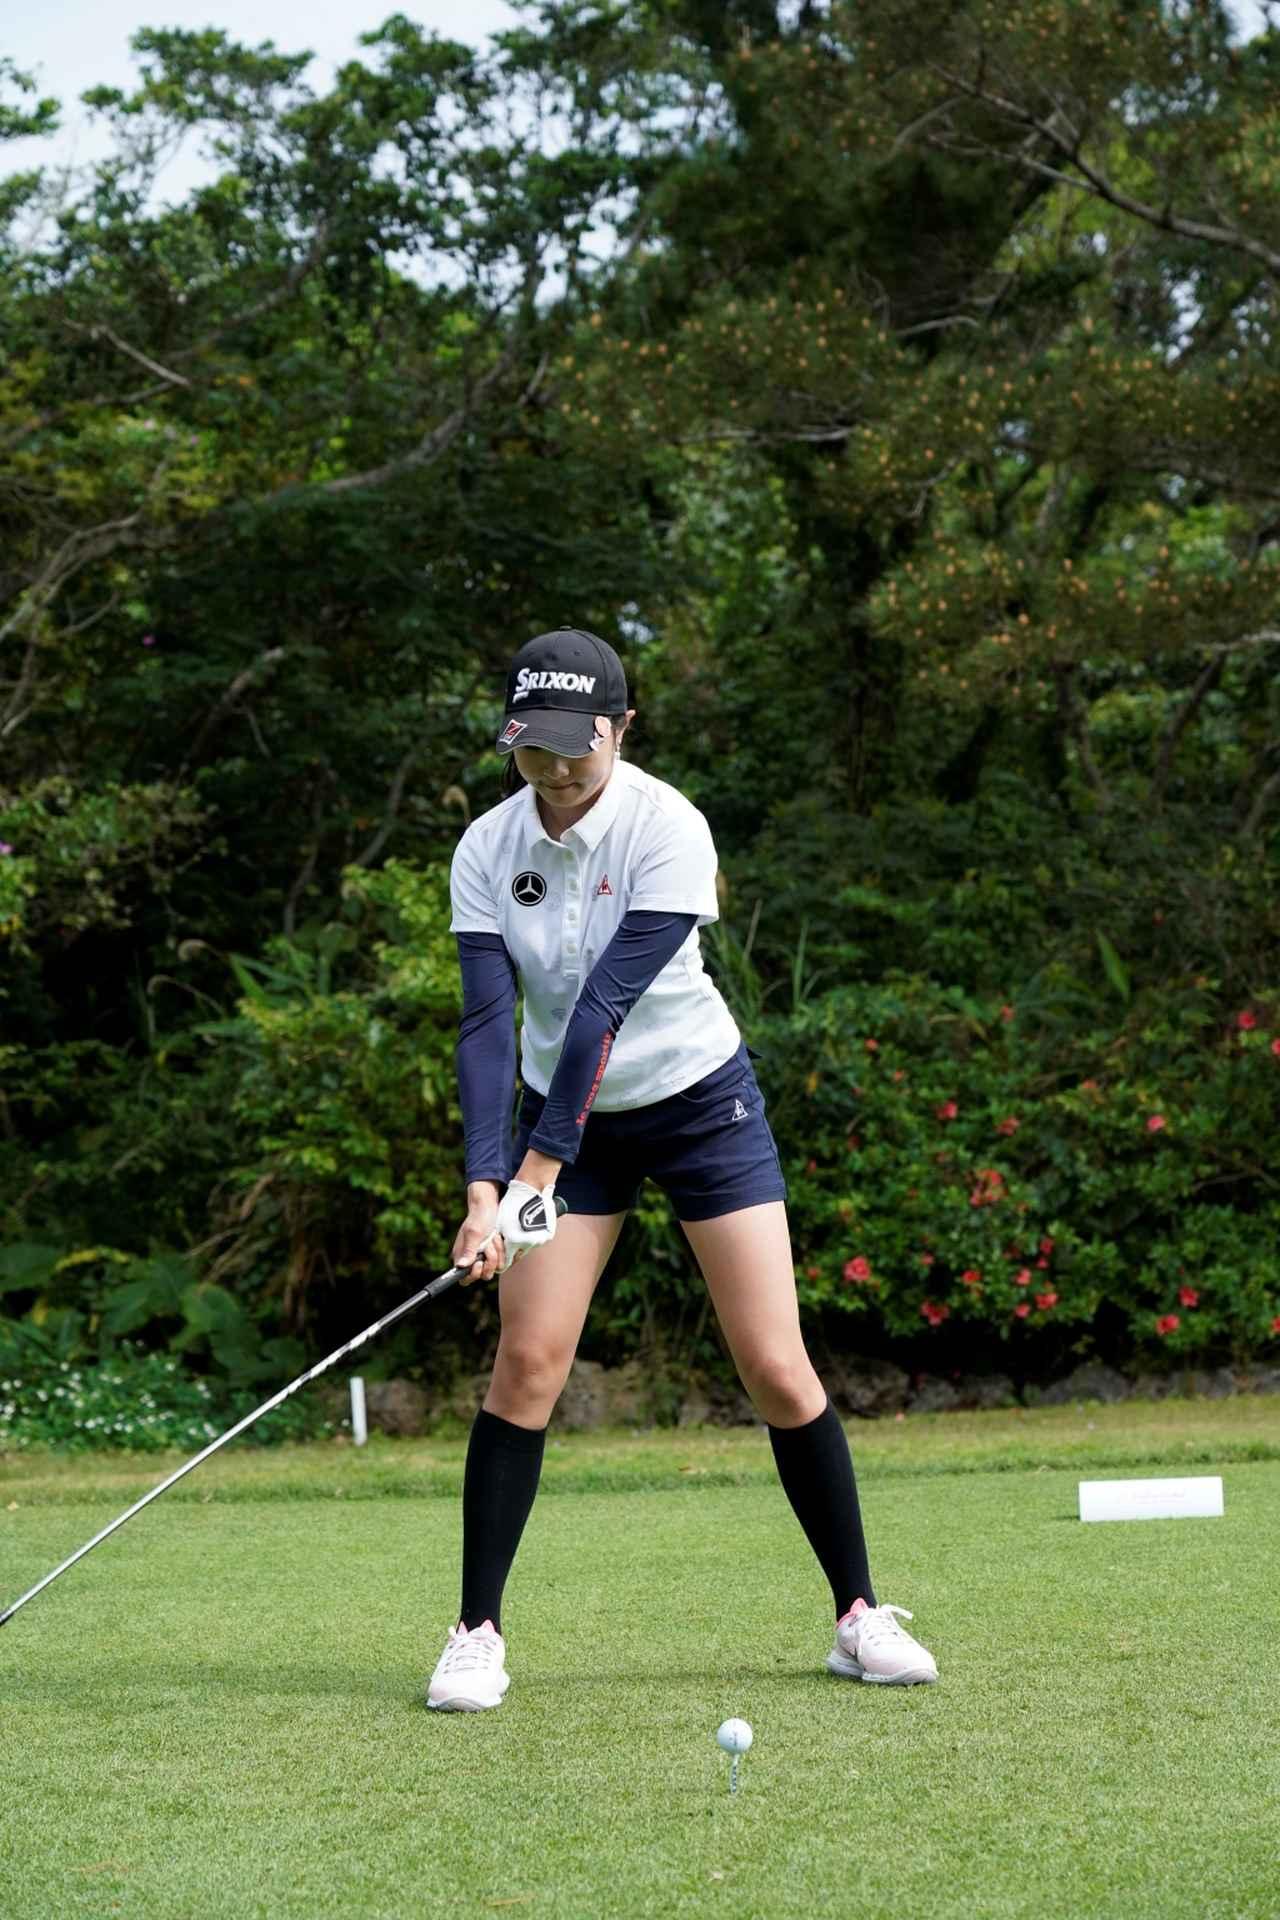 Images : 3番目の画像 - 三浦桃香のドライバー連続写真 - みんなのゴルフダイジェスト